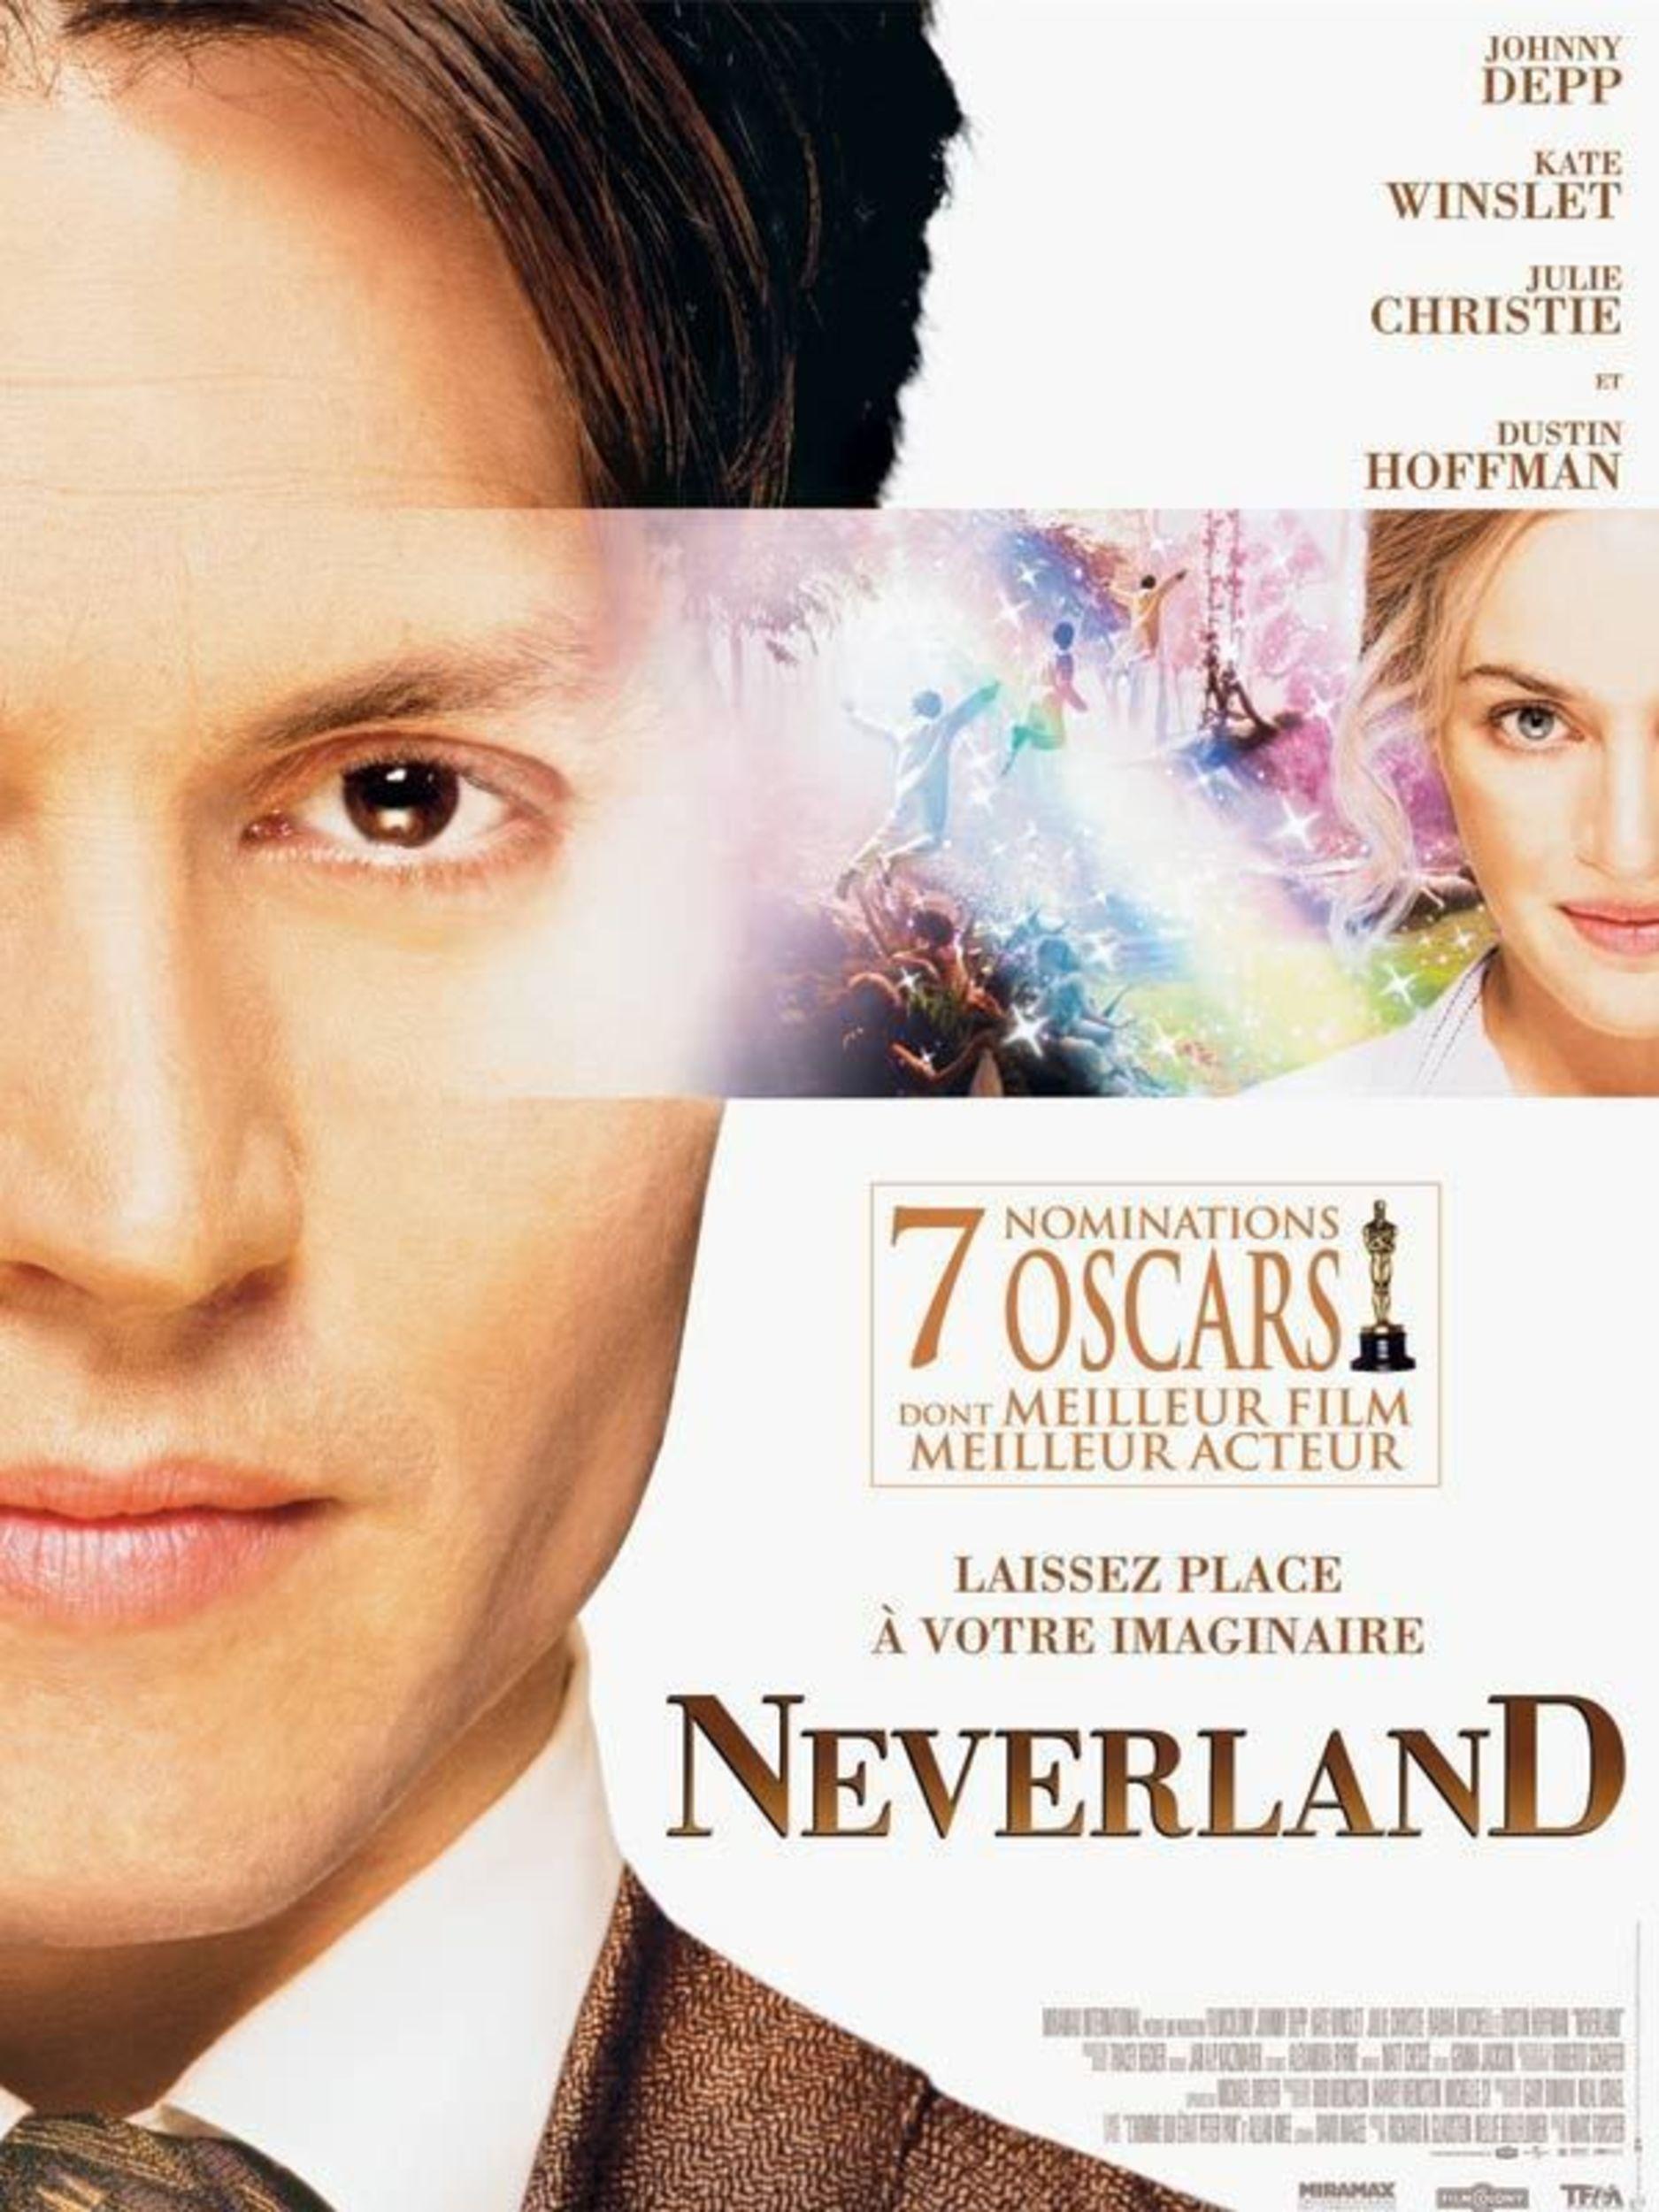 affiche poster finding neverland disney miramax